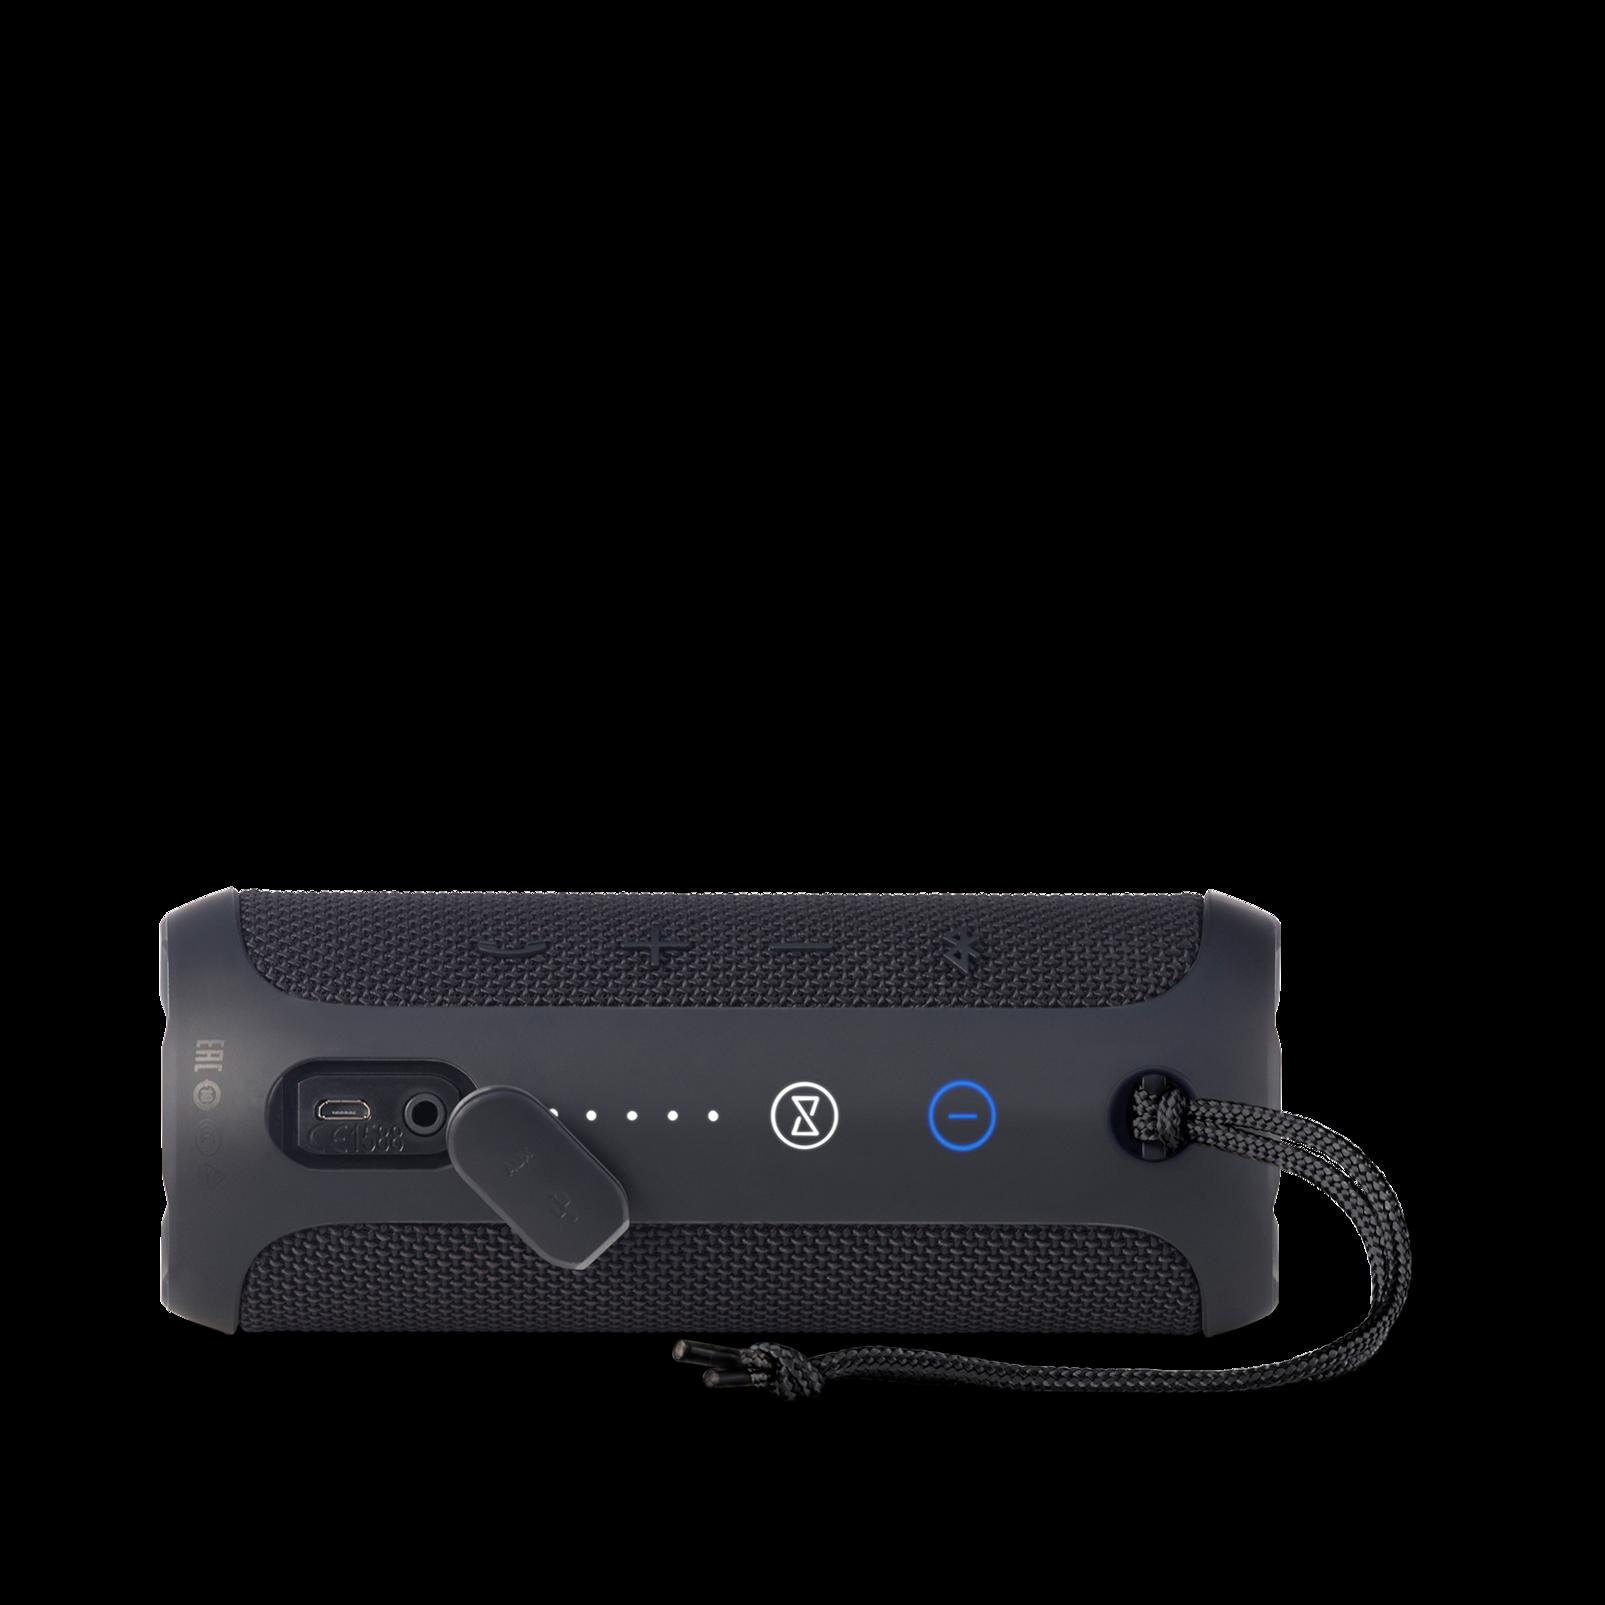 JBL Flip 3 - Black - Splashproof portable Bluetooth speaker with powerful sound and speakerphone technology - Detailshot 3